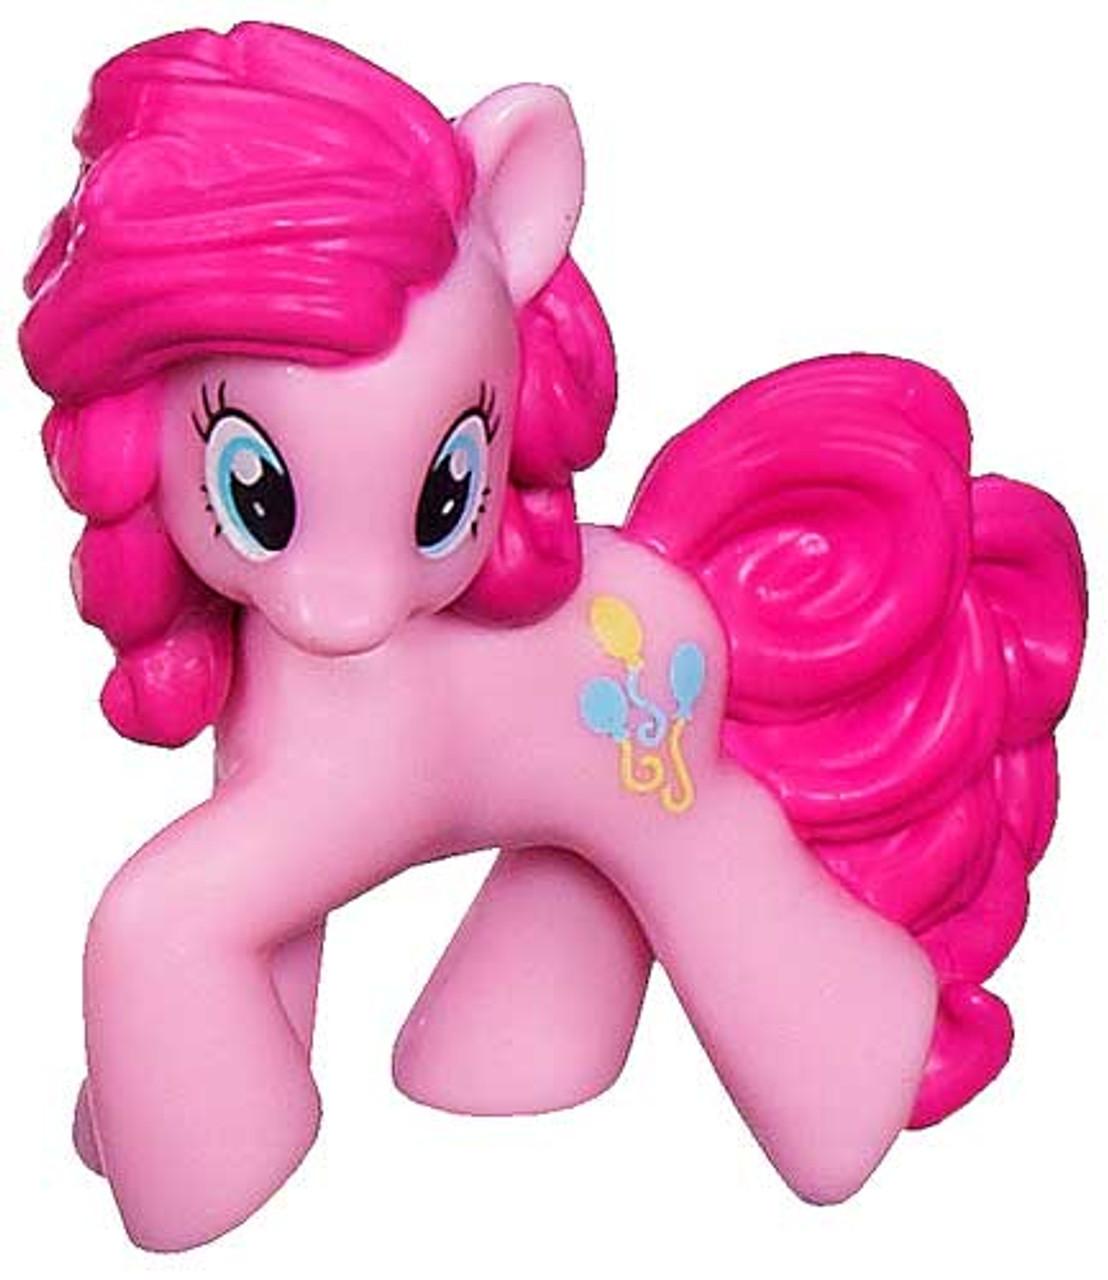 My Little Pony Friendship is Magic 2 Inch Pinkie Pie PVC Figure [Version 2]